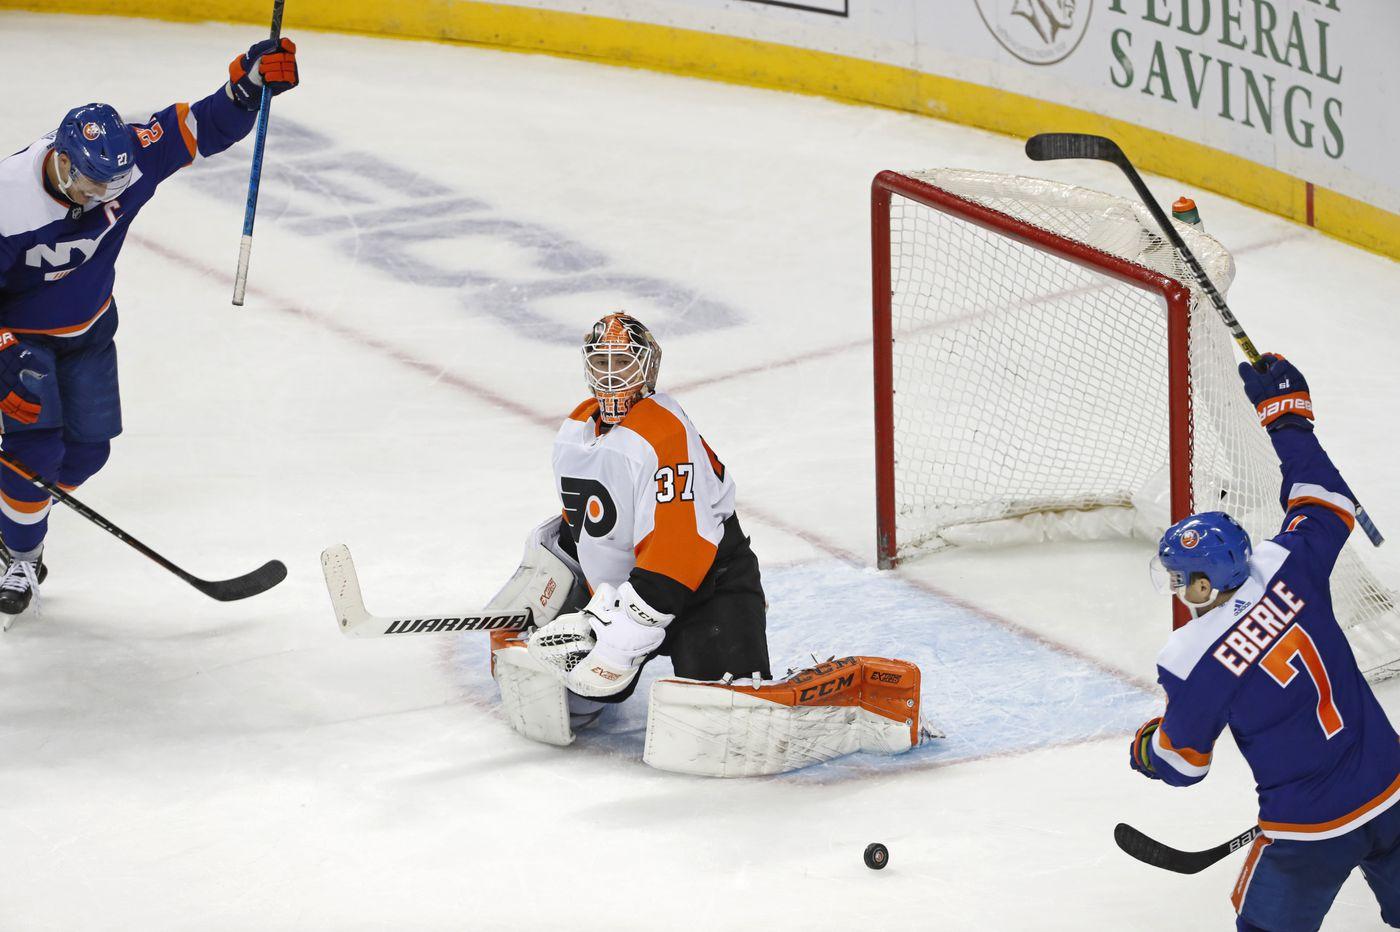 Late goal sinks Flyers in 5-3 loss to New York Islanders